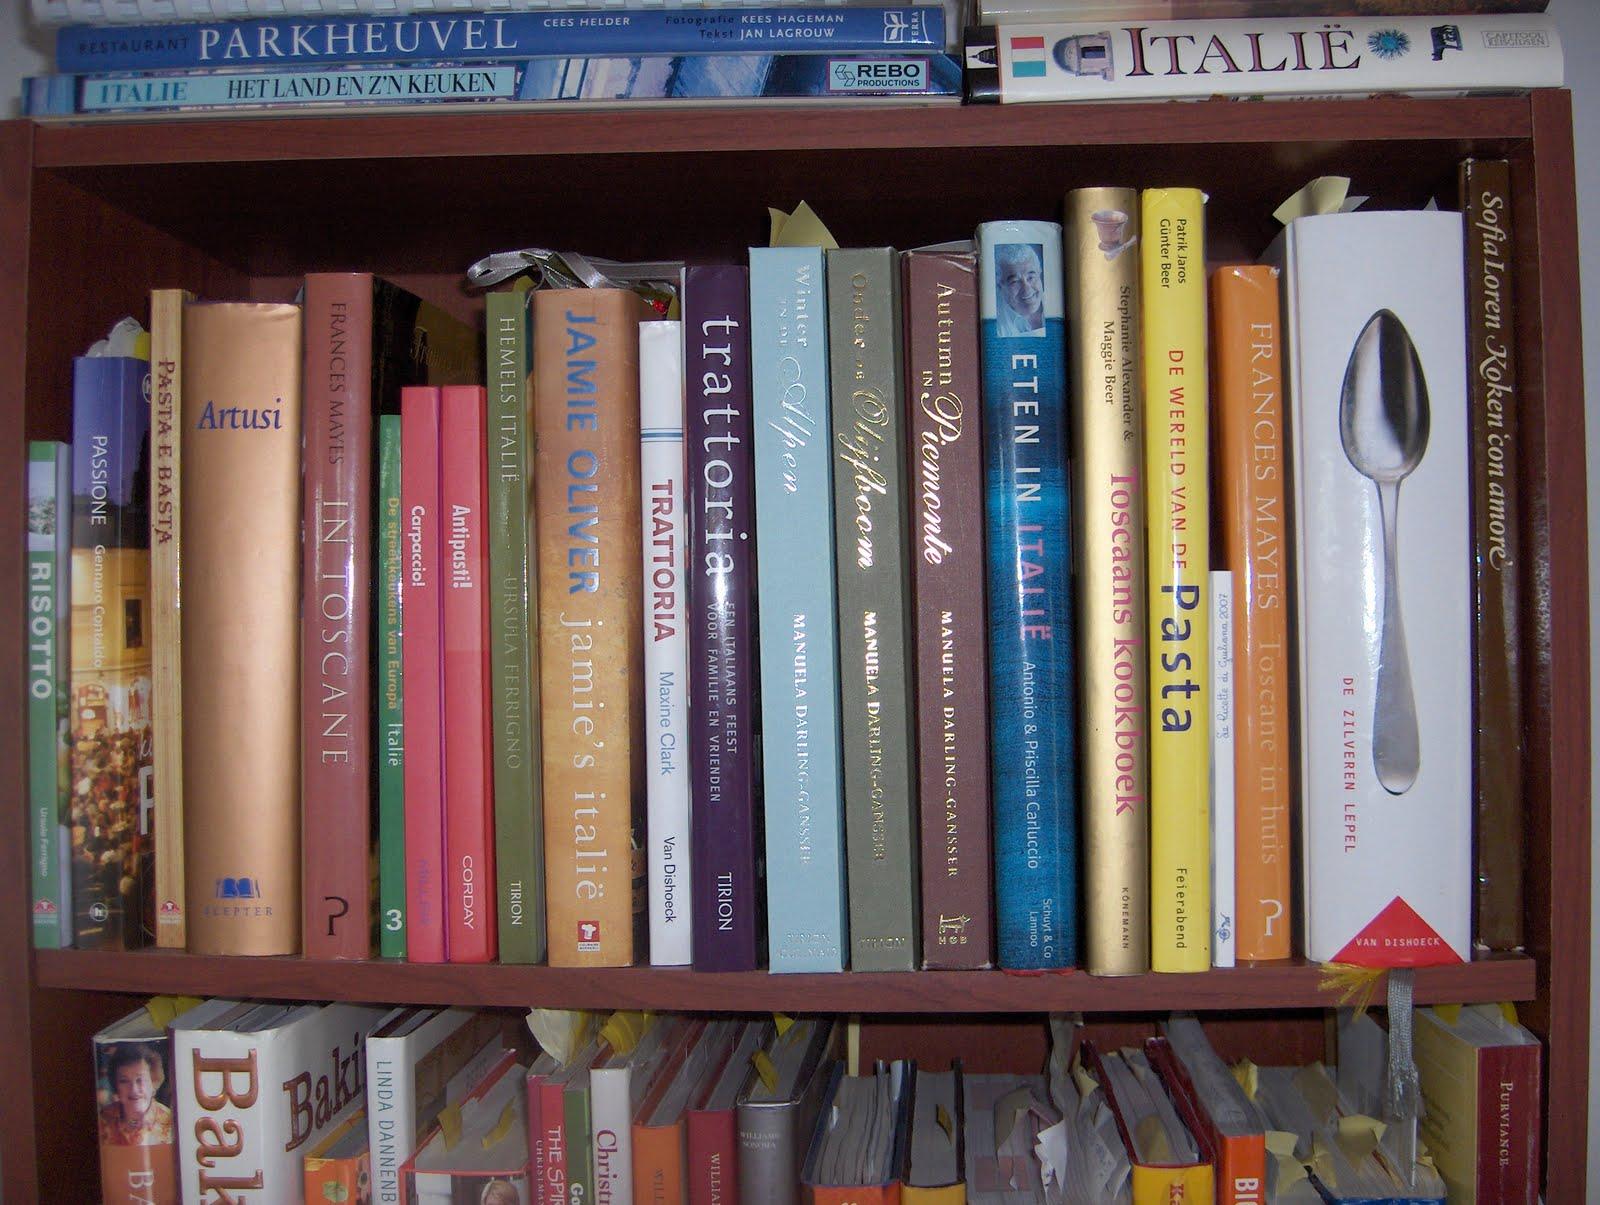 gennaro contaldo pasta book pdf